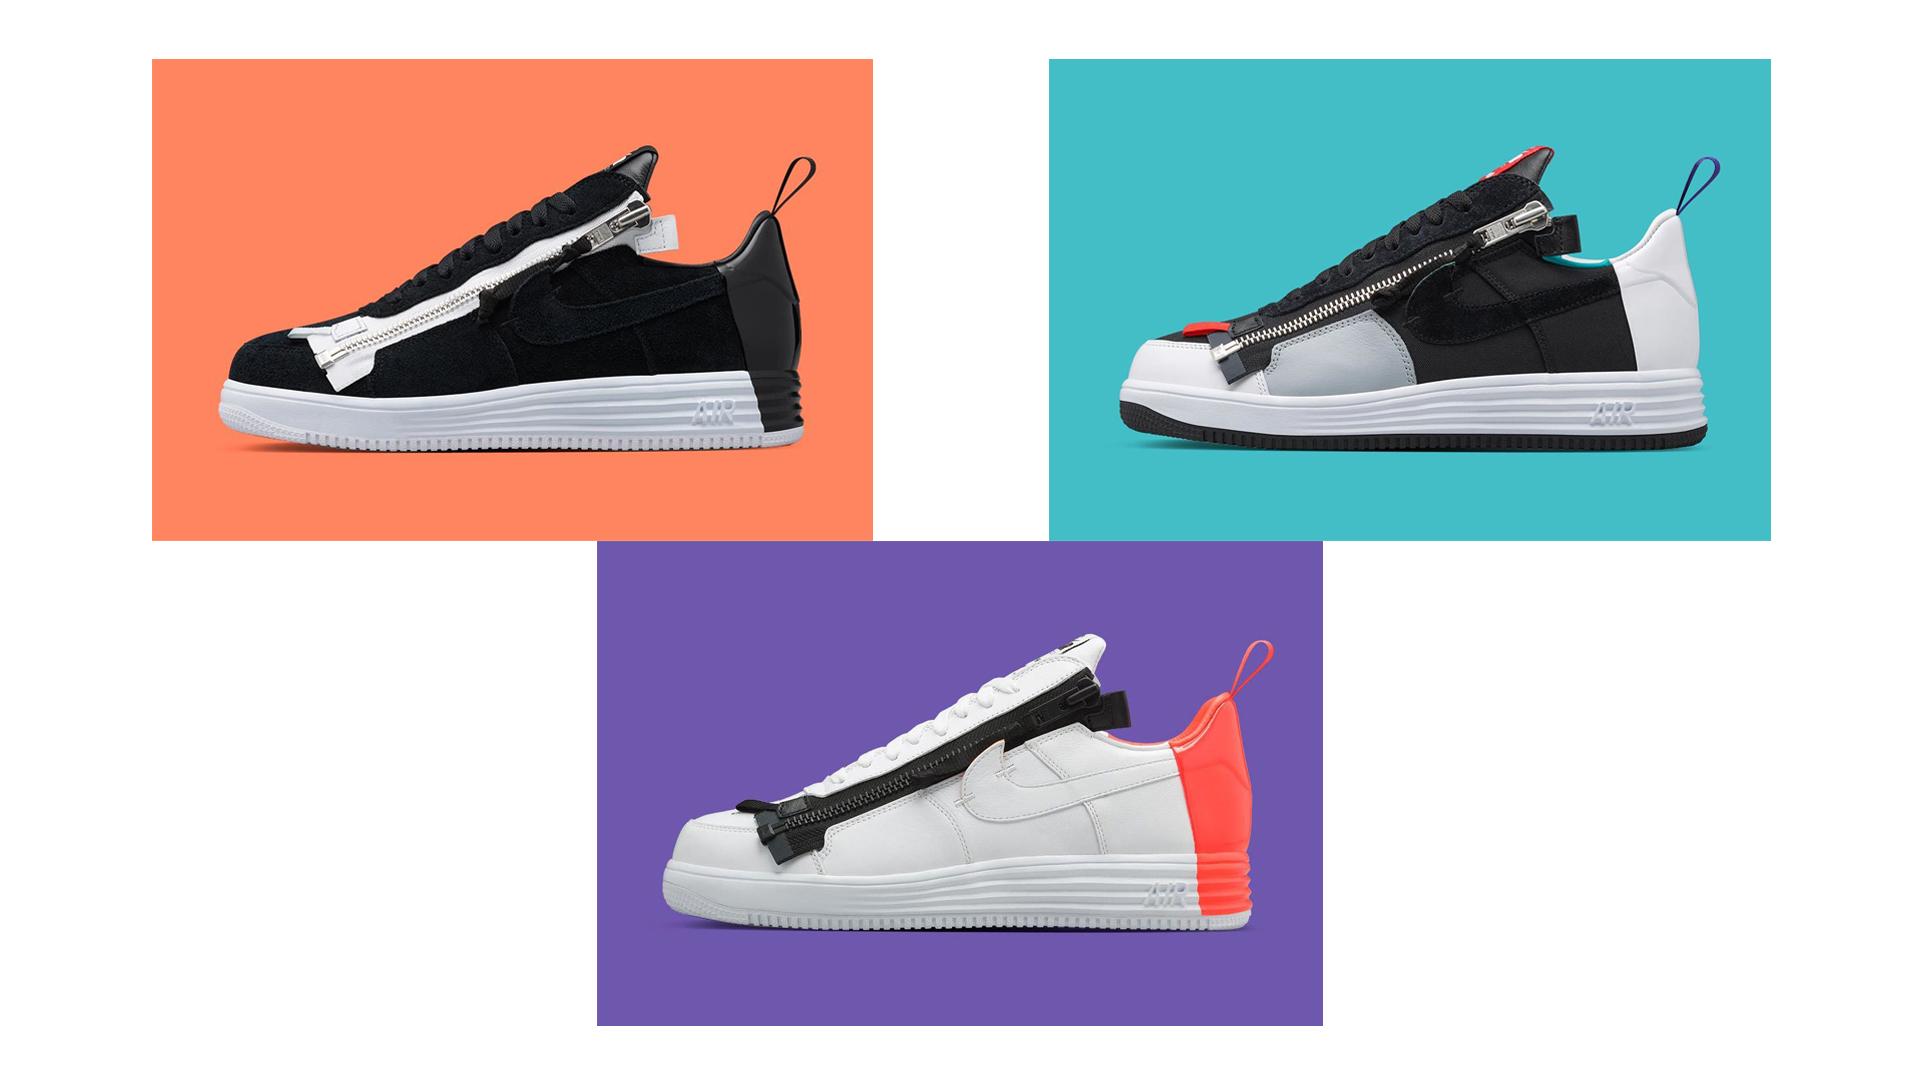 ACRONYM x Nike Lunar Force 1 // Kép: SneakerFreaker